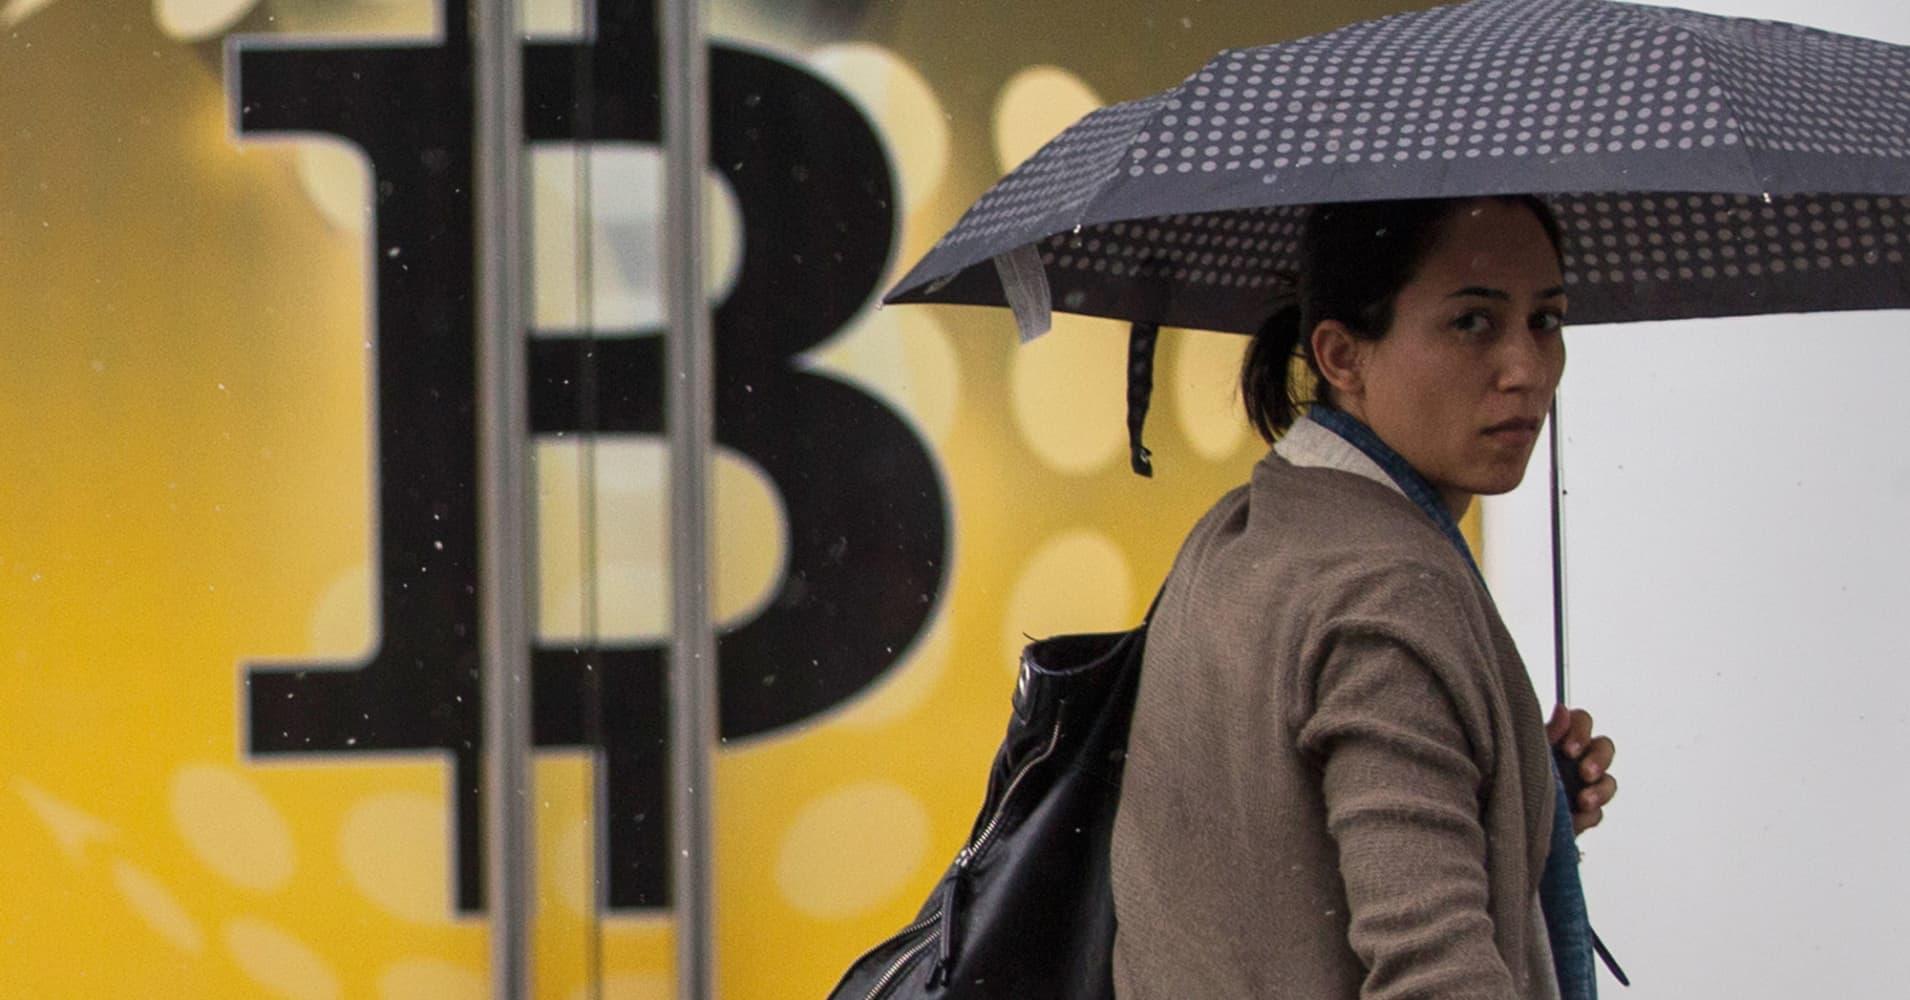 Bitcoin briefly plunges below $2,100 as upward momentum fades